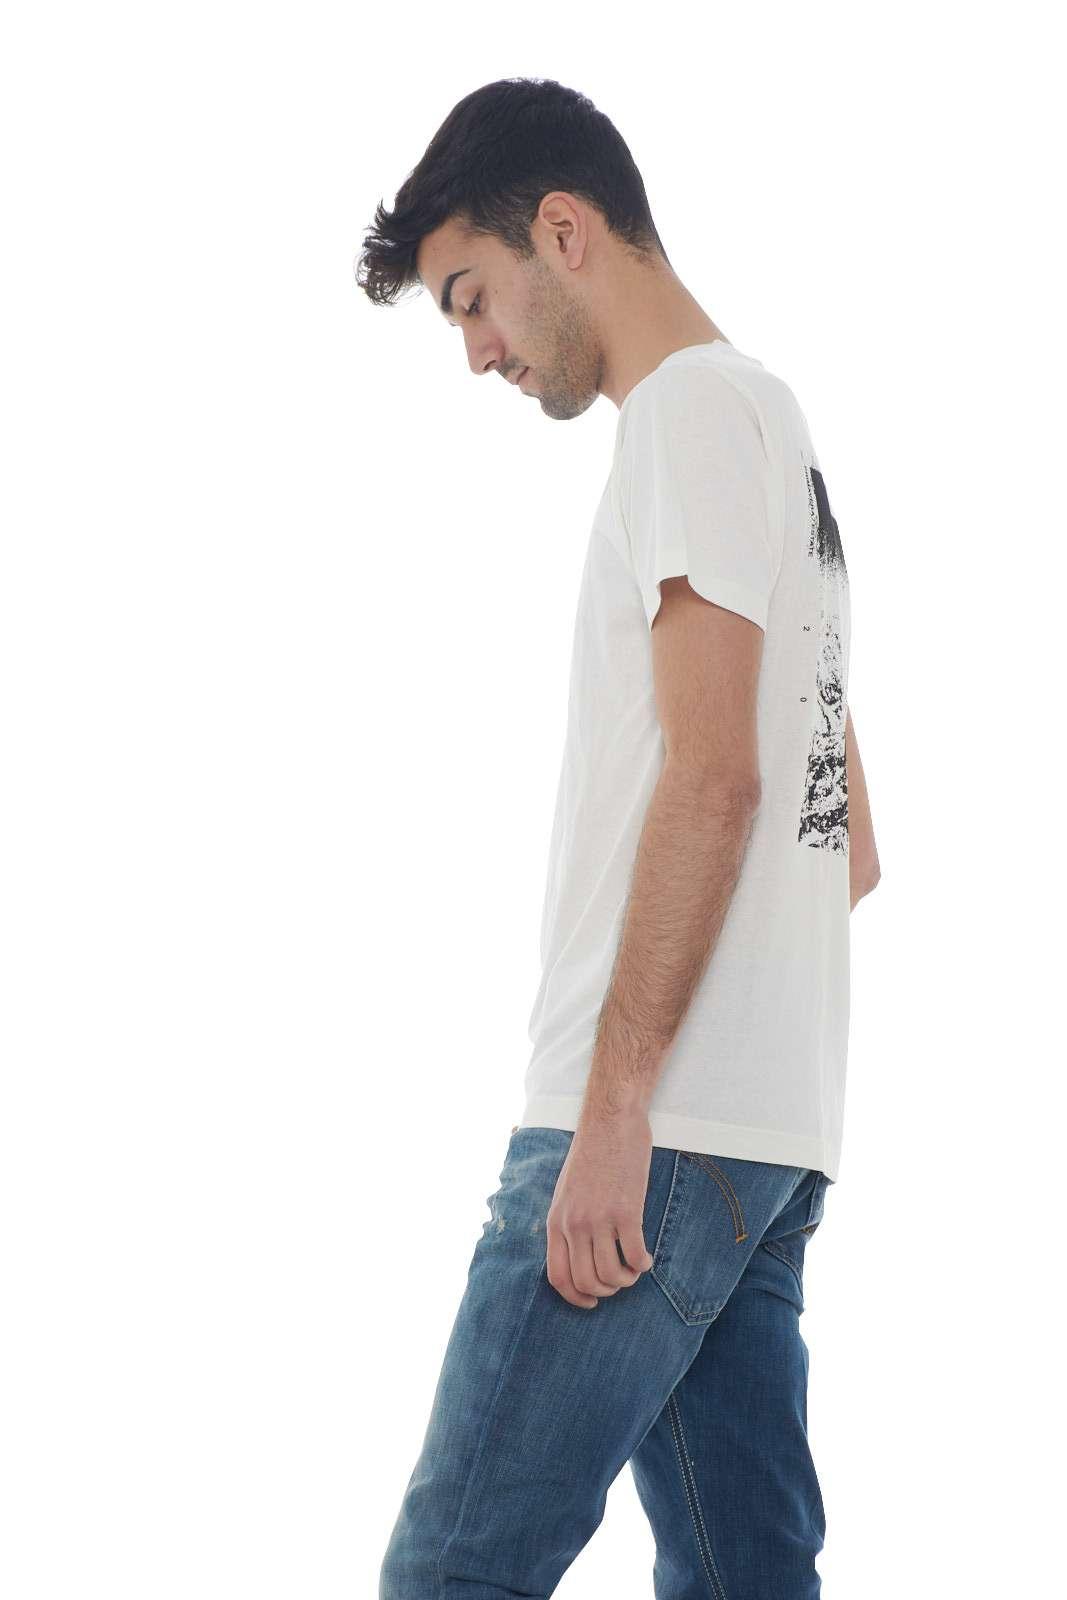 https://www.parmax.com/media/catalog/product/a/i/PE-outlet_parmax-t-shirt-uomo-Stone-Island-72152ns84-B.jpg